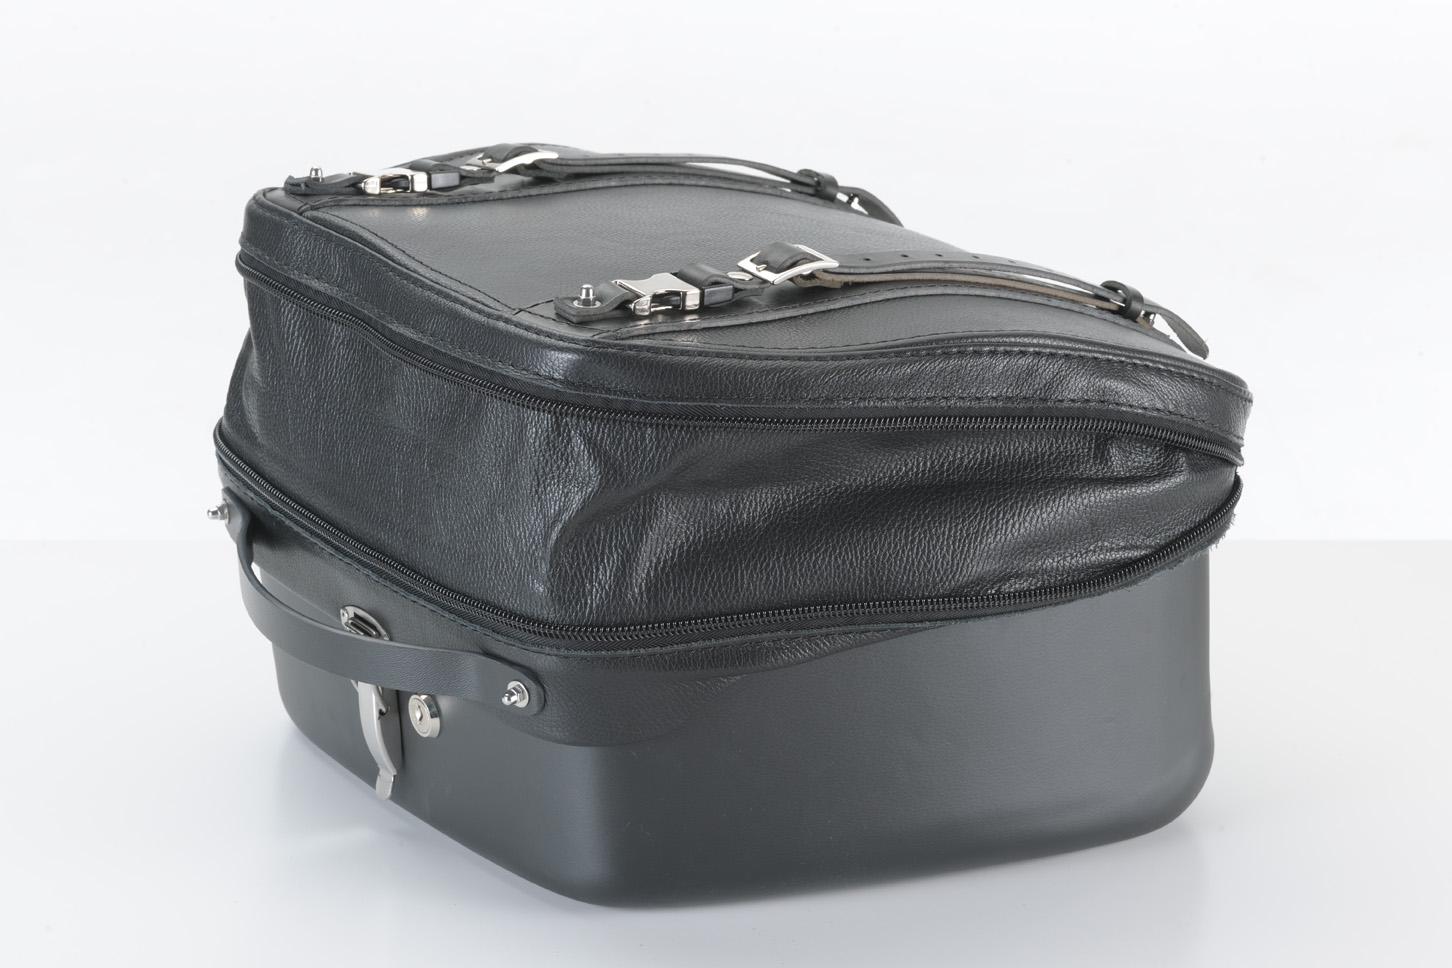 Bauletto-MCJ-per-Yamaha-T-Max-espanso